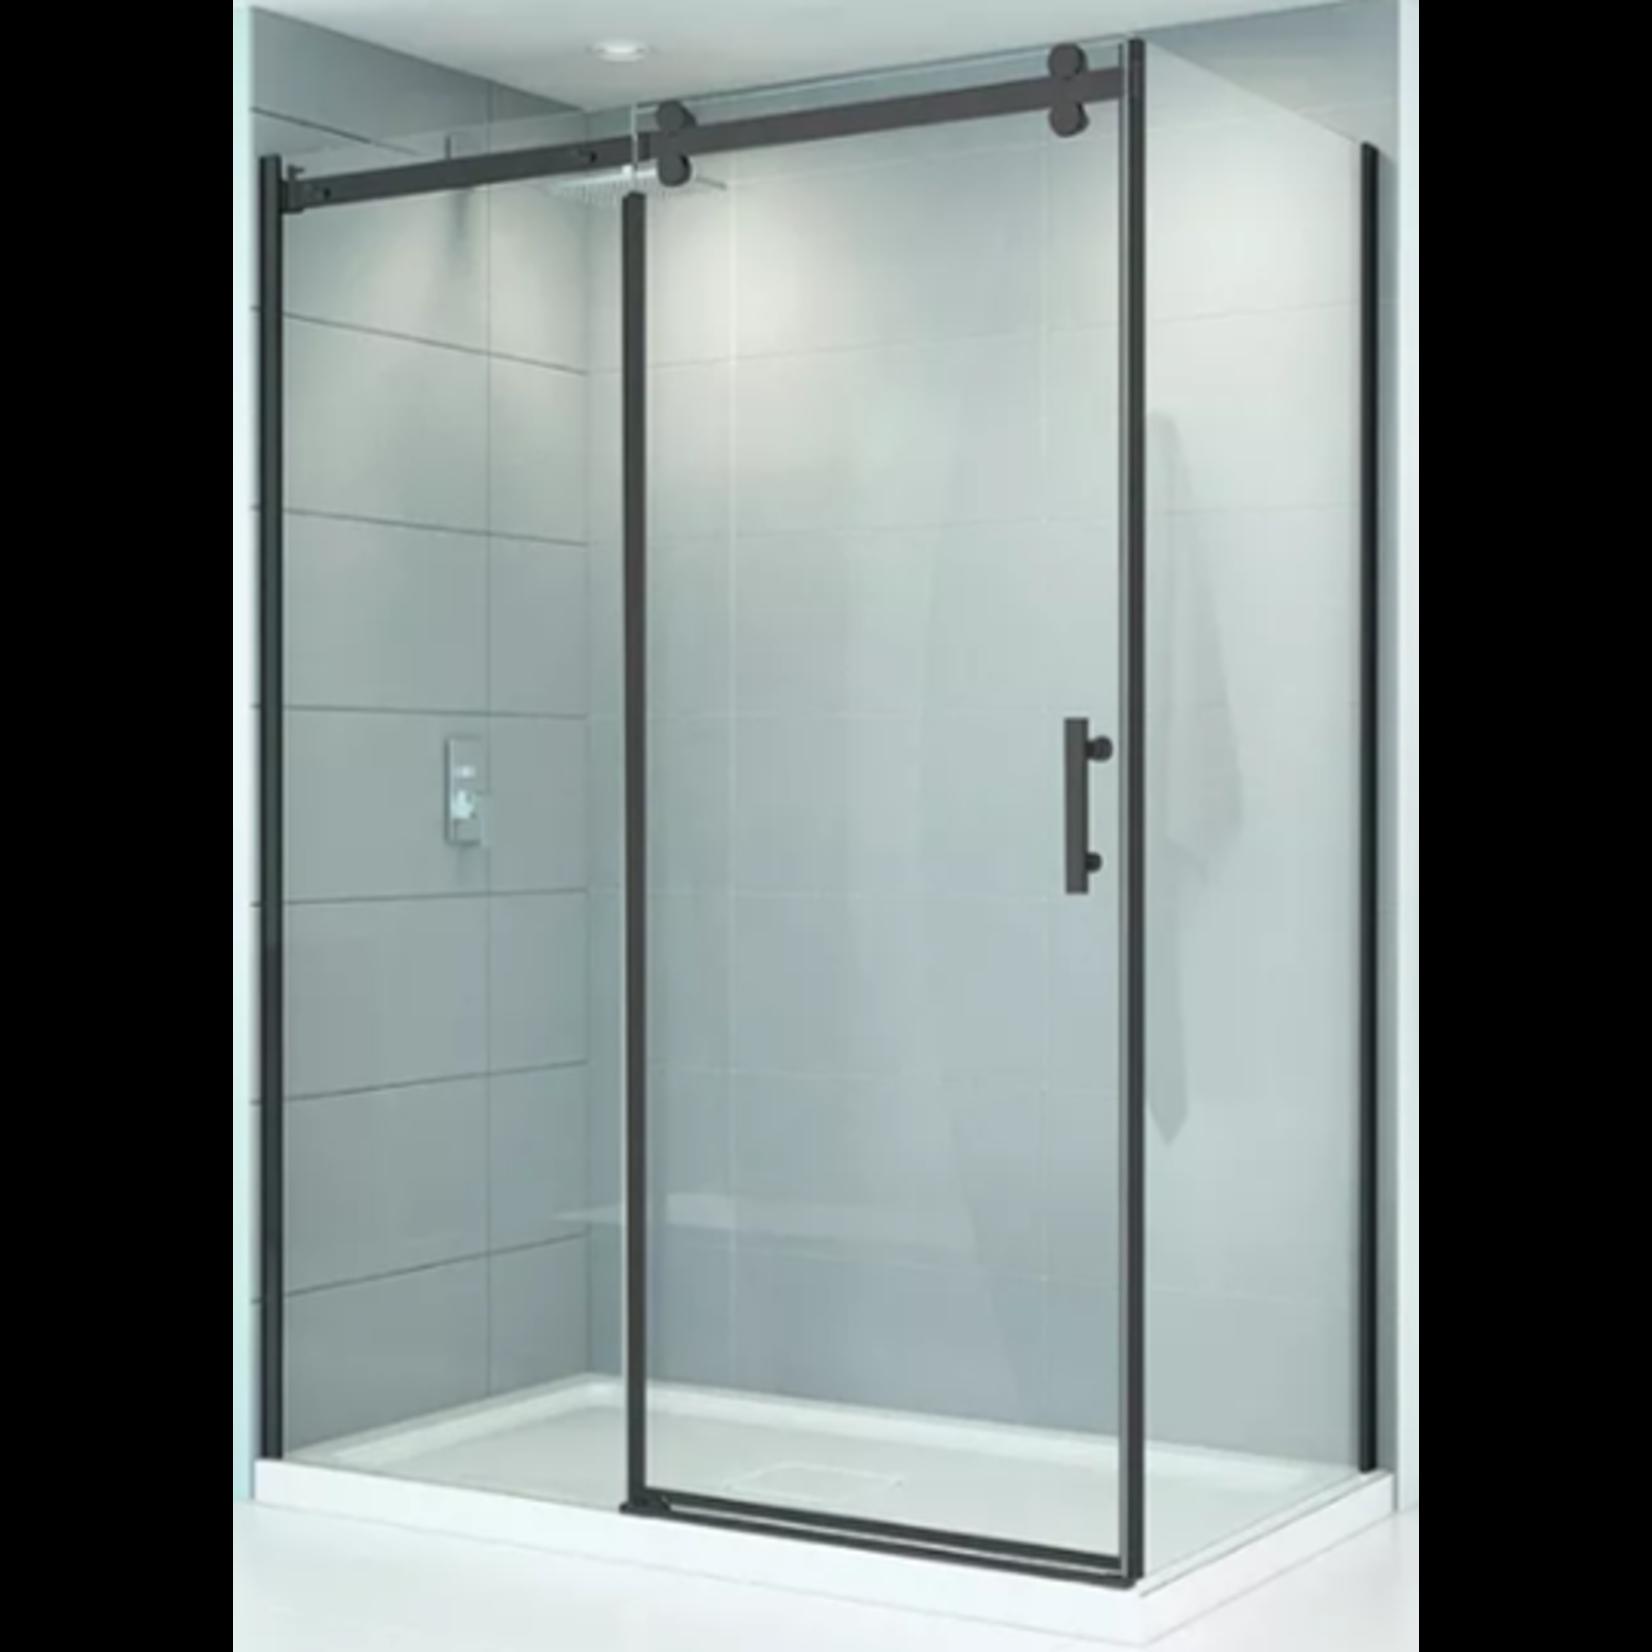 Reversible shower set 32x60 black Quartz series CDC